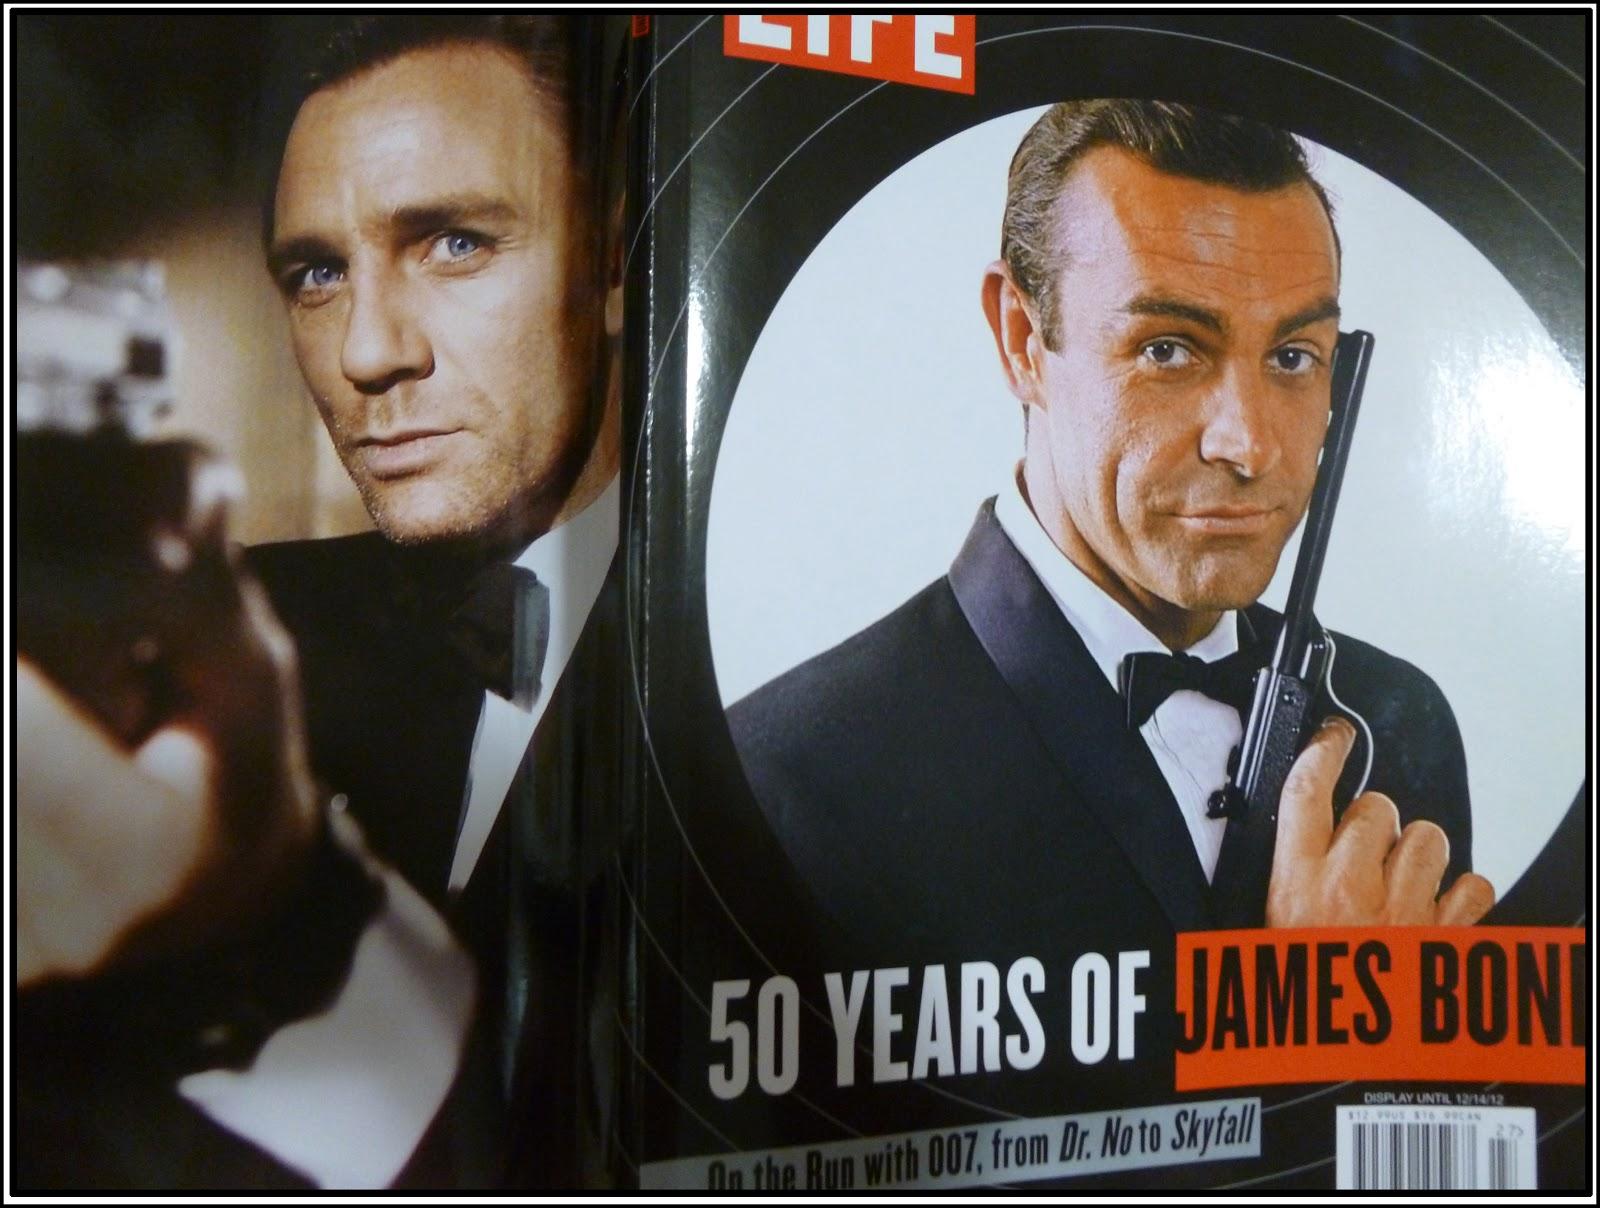 James Bond Name